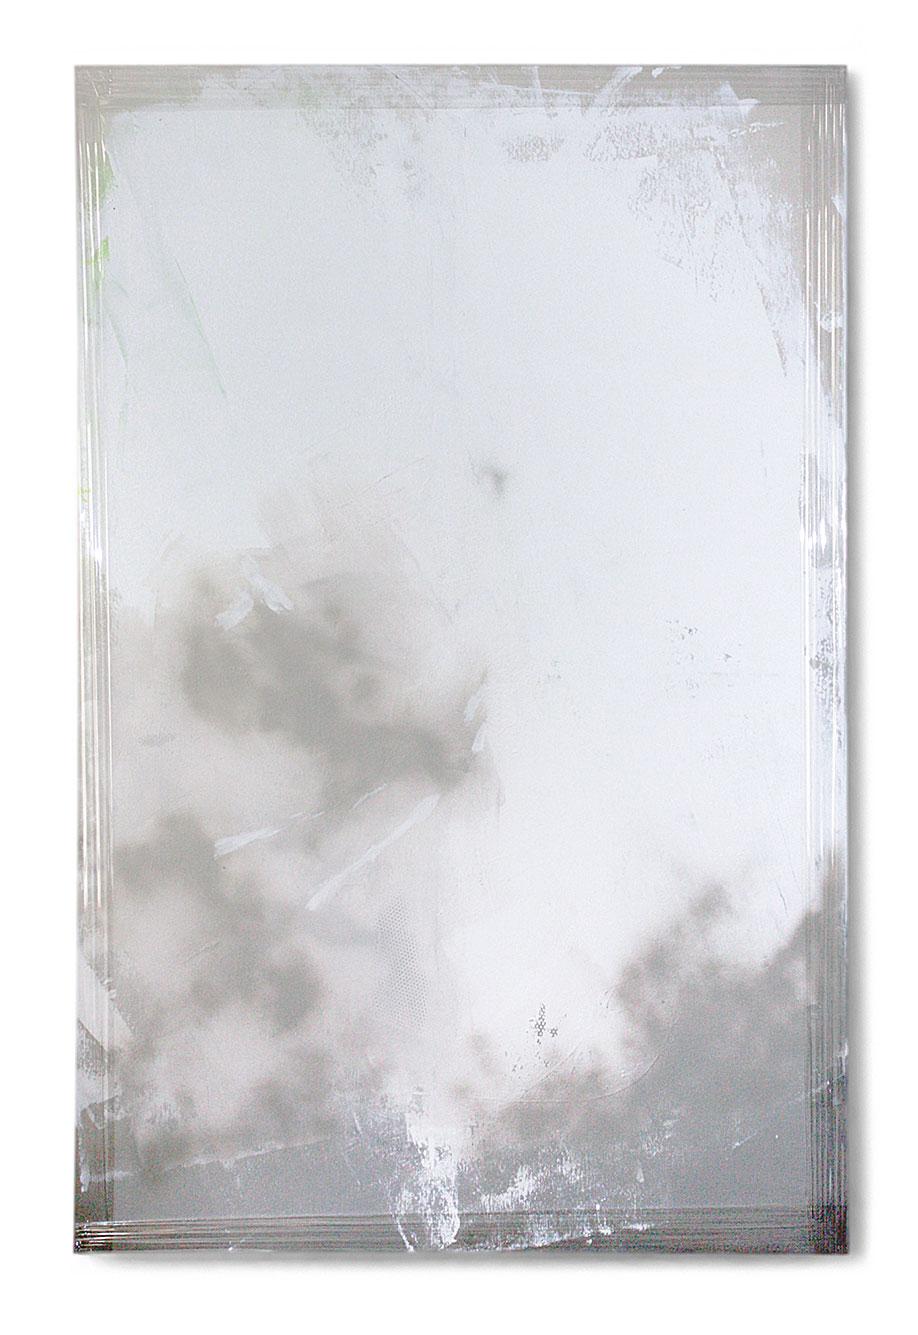 <b>Title:</b>131002<br /><b>Year:</b>2013<br /><b>Medium:</b>Acrylic, lacquer, spray paint, and PE film on canvas<br /><b>Size:</b>185 x 130 cm